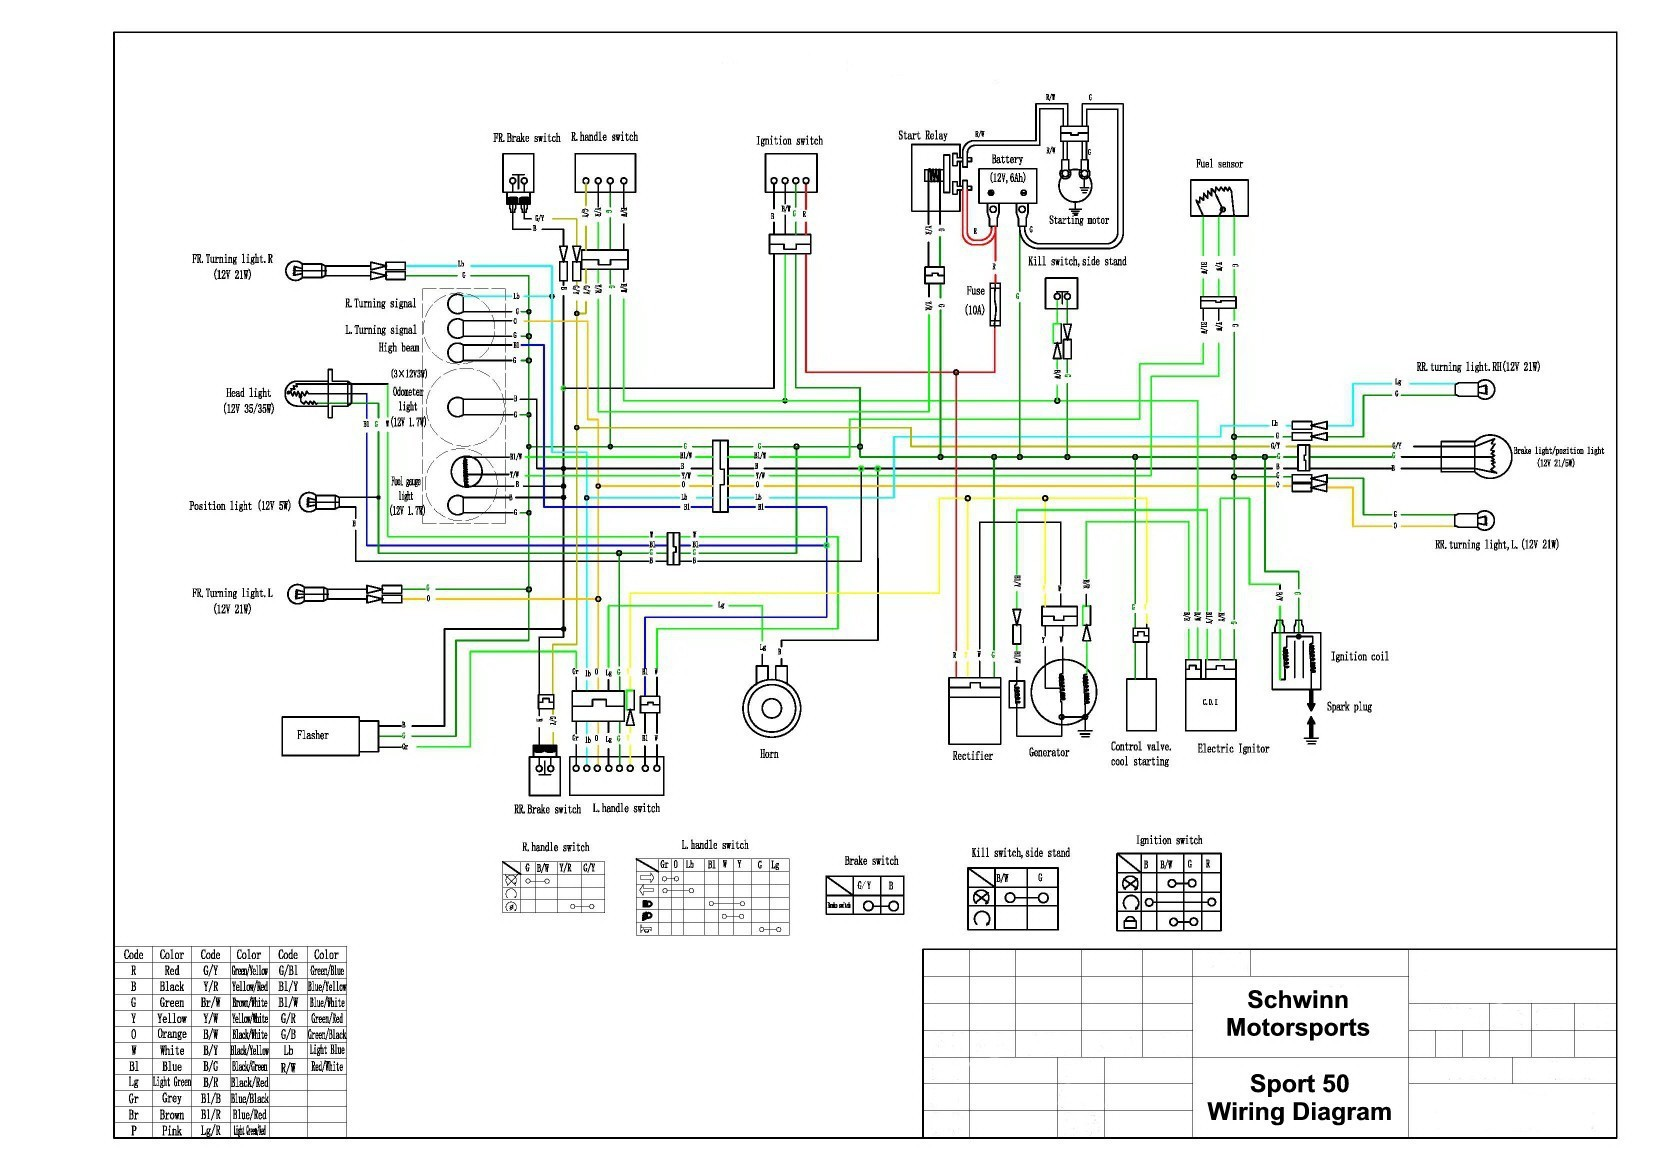 2006 Linhai 260 Atv Ignition Switch Wiring Diagram Free Download Key Scooter Wire Explore Schematic U2022